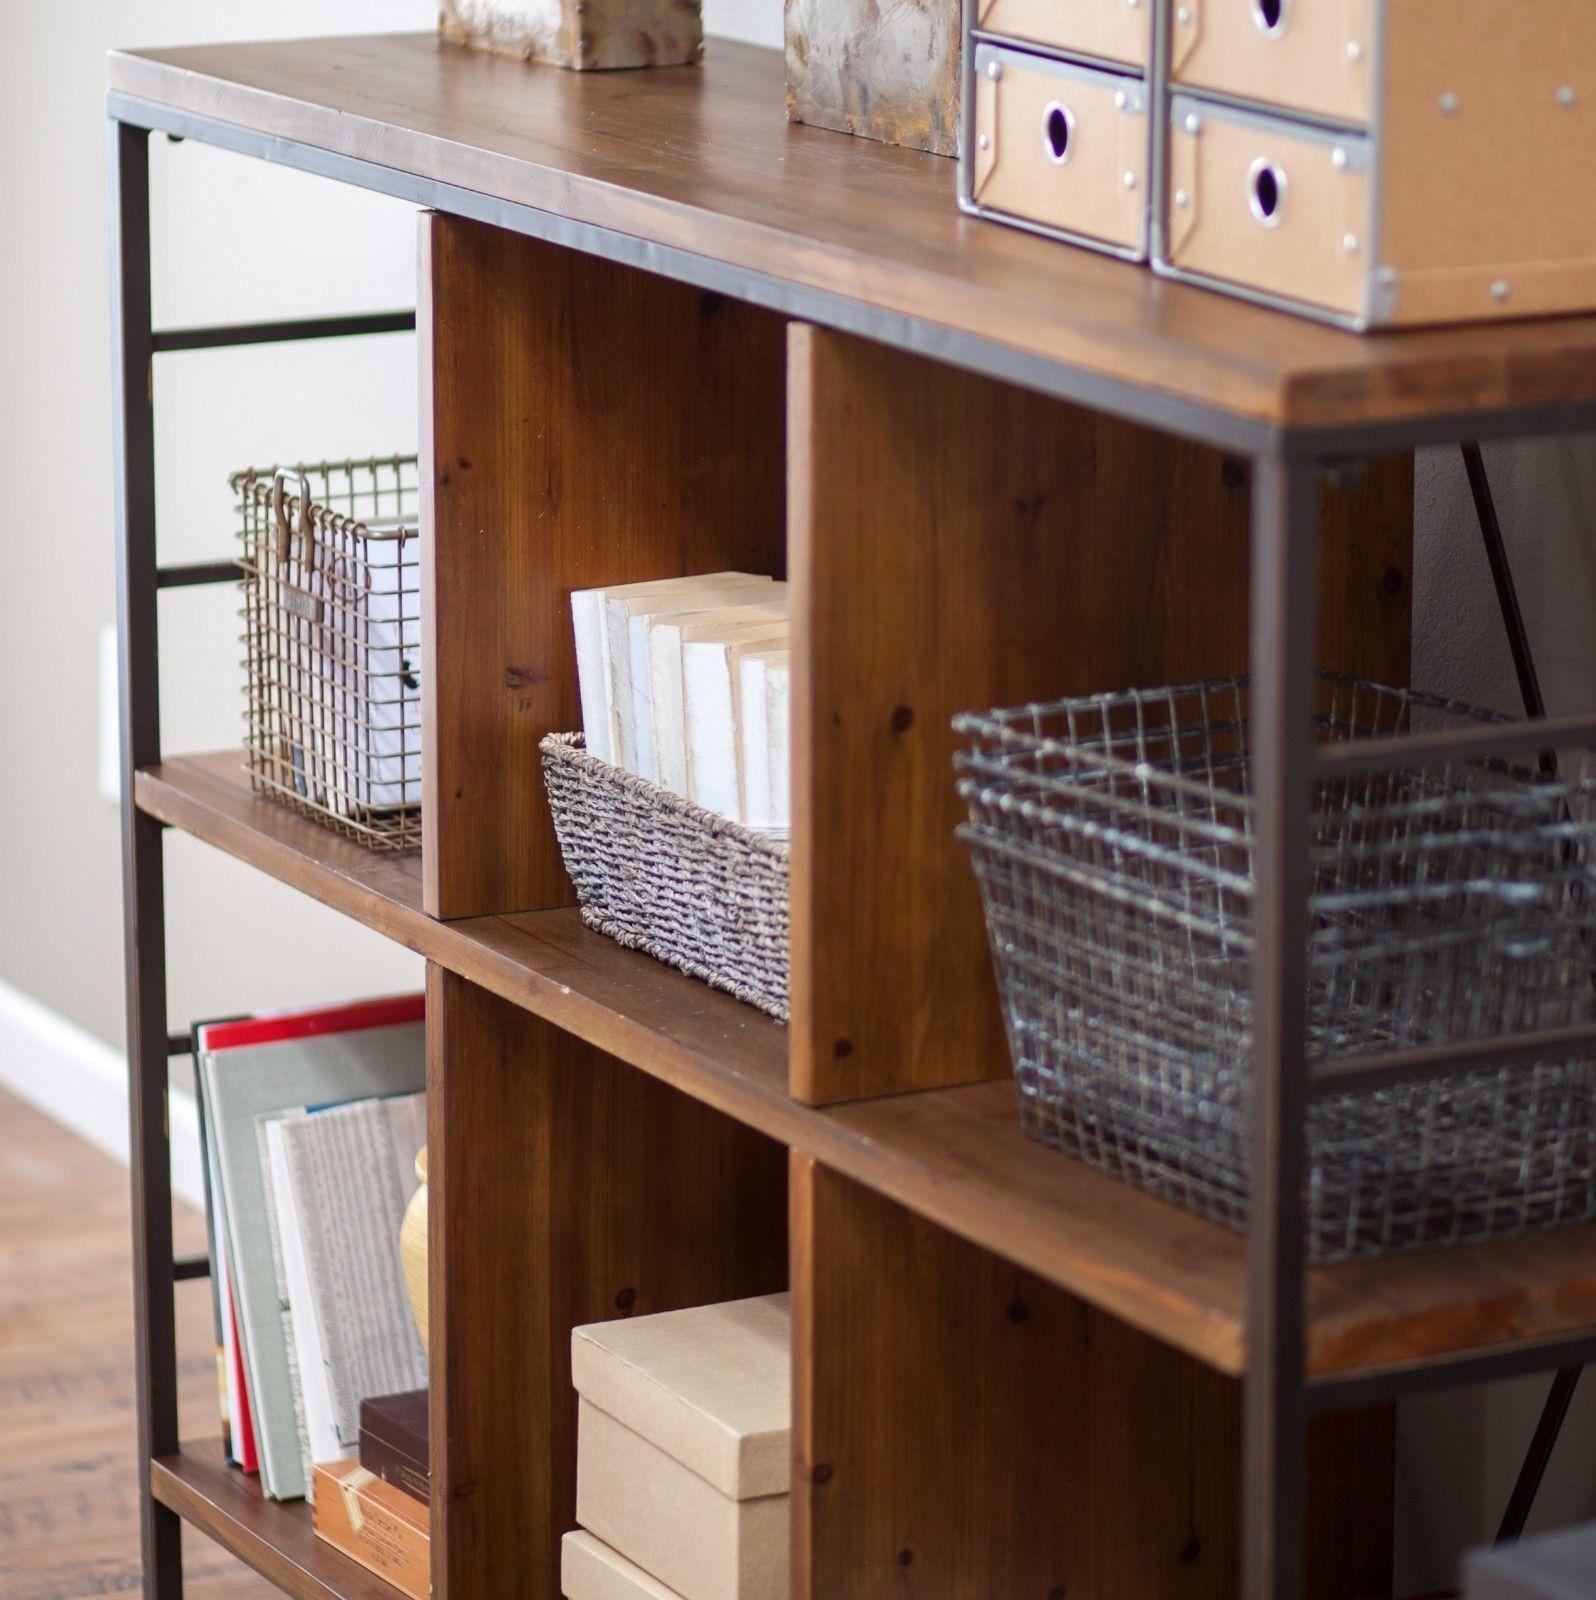 6 Cube Bookcase Bookshelf Rustic Bronze Storage Organizer Display Cabinet